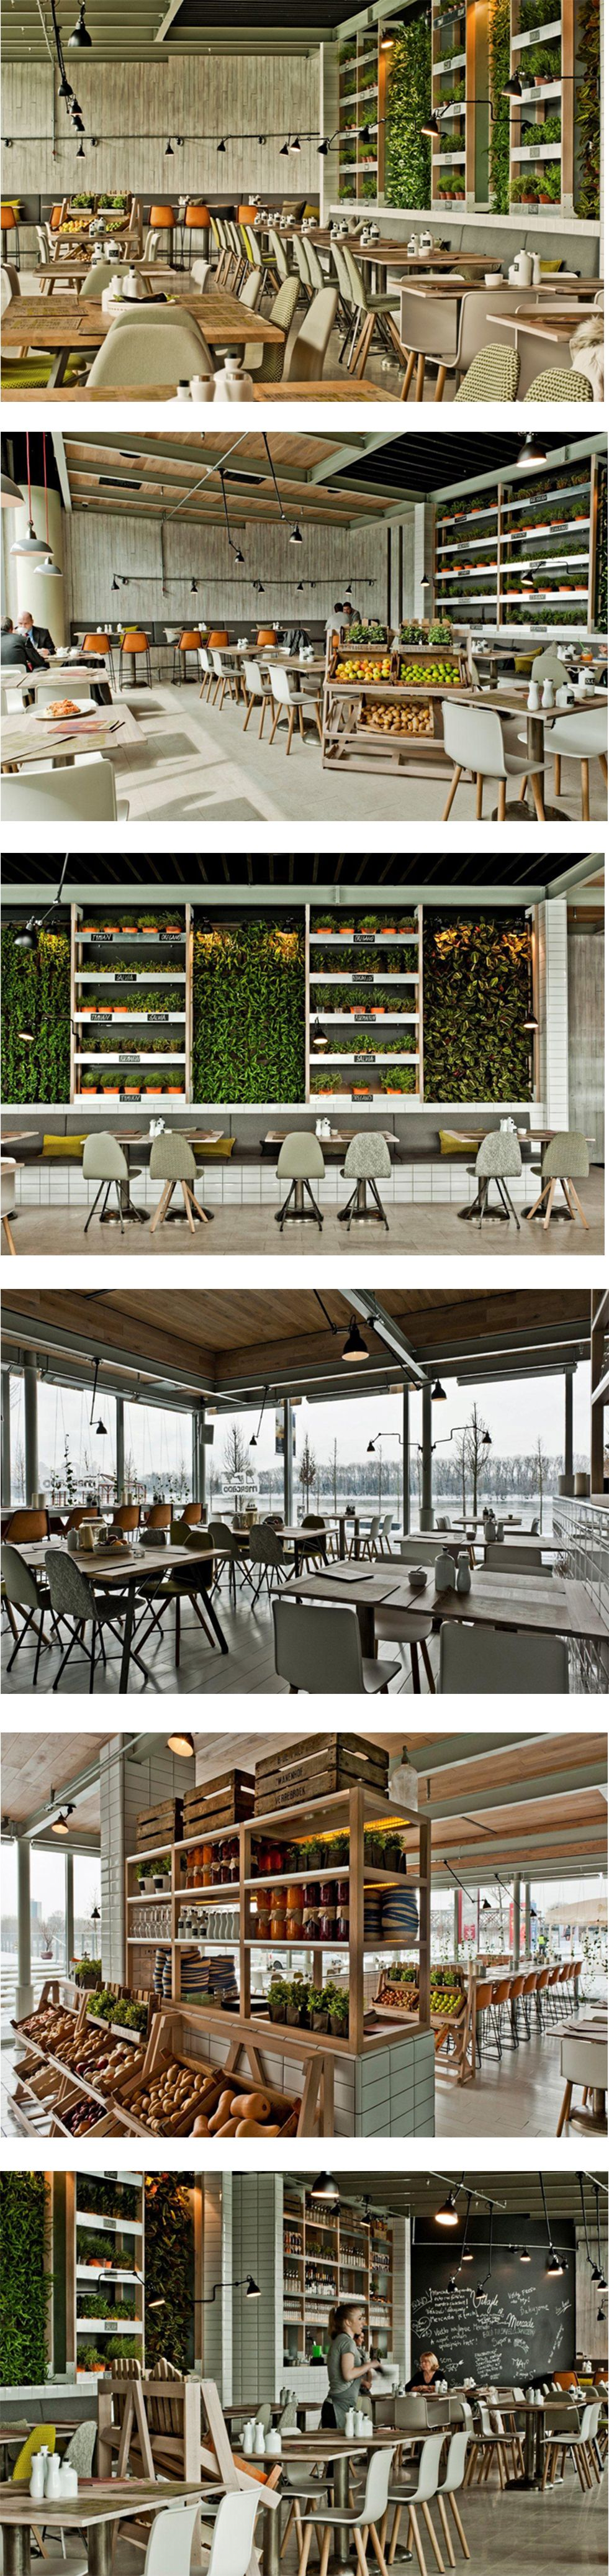 mercado, restaurant interior style, plants, decoration, warm style